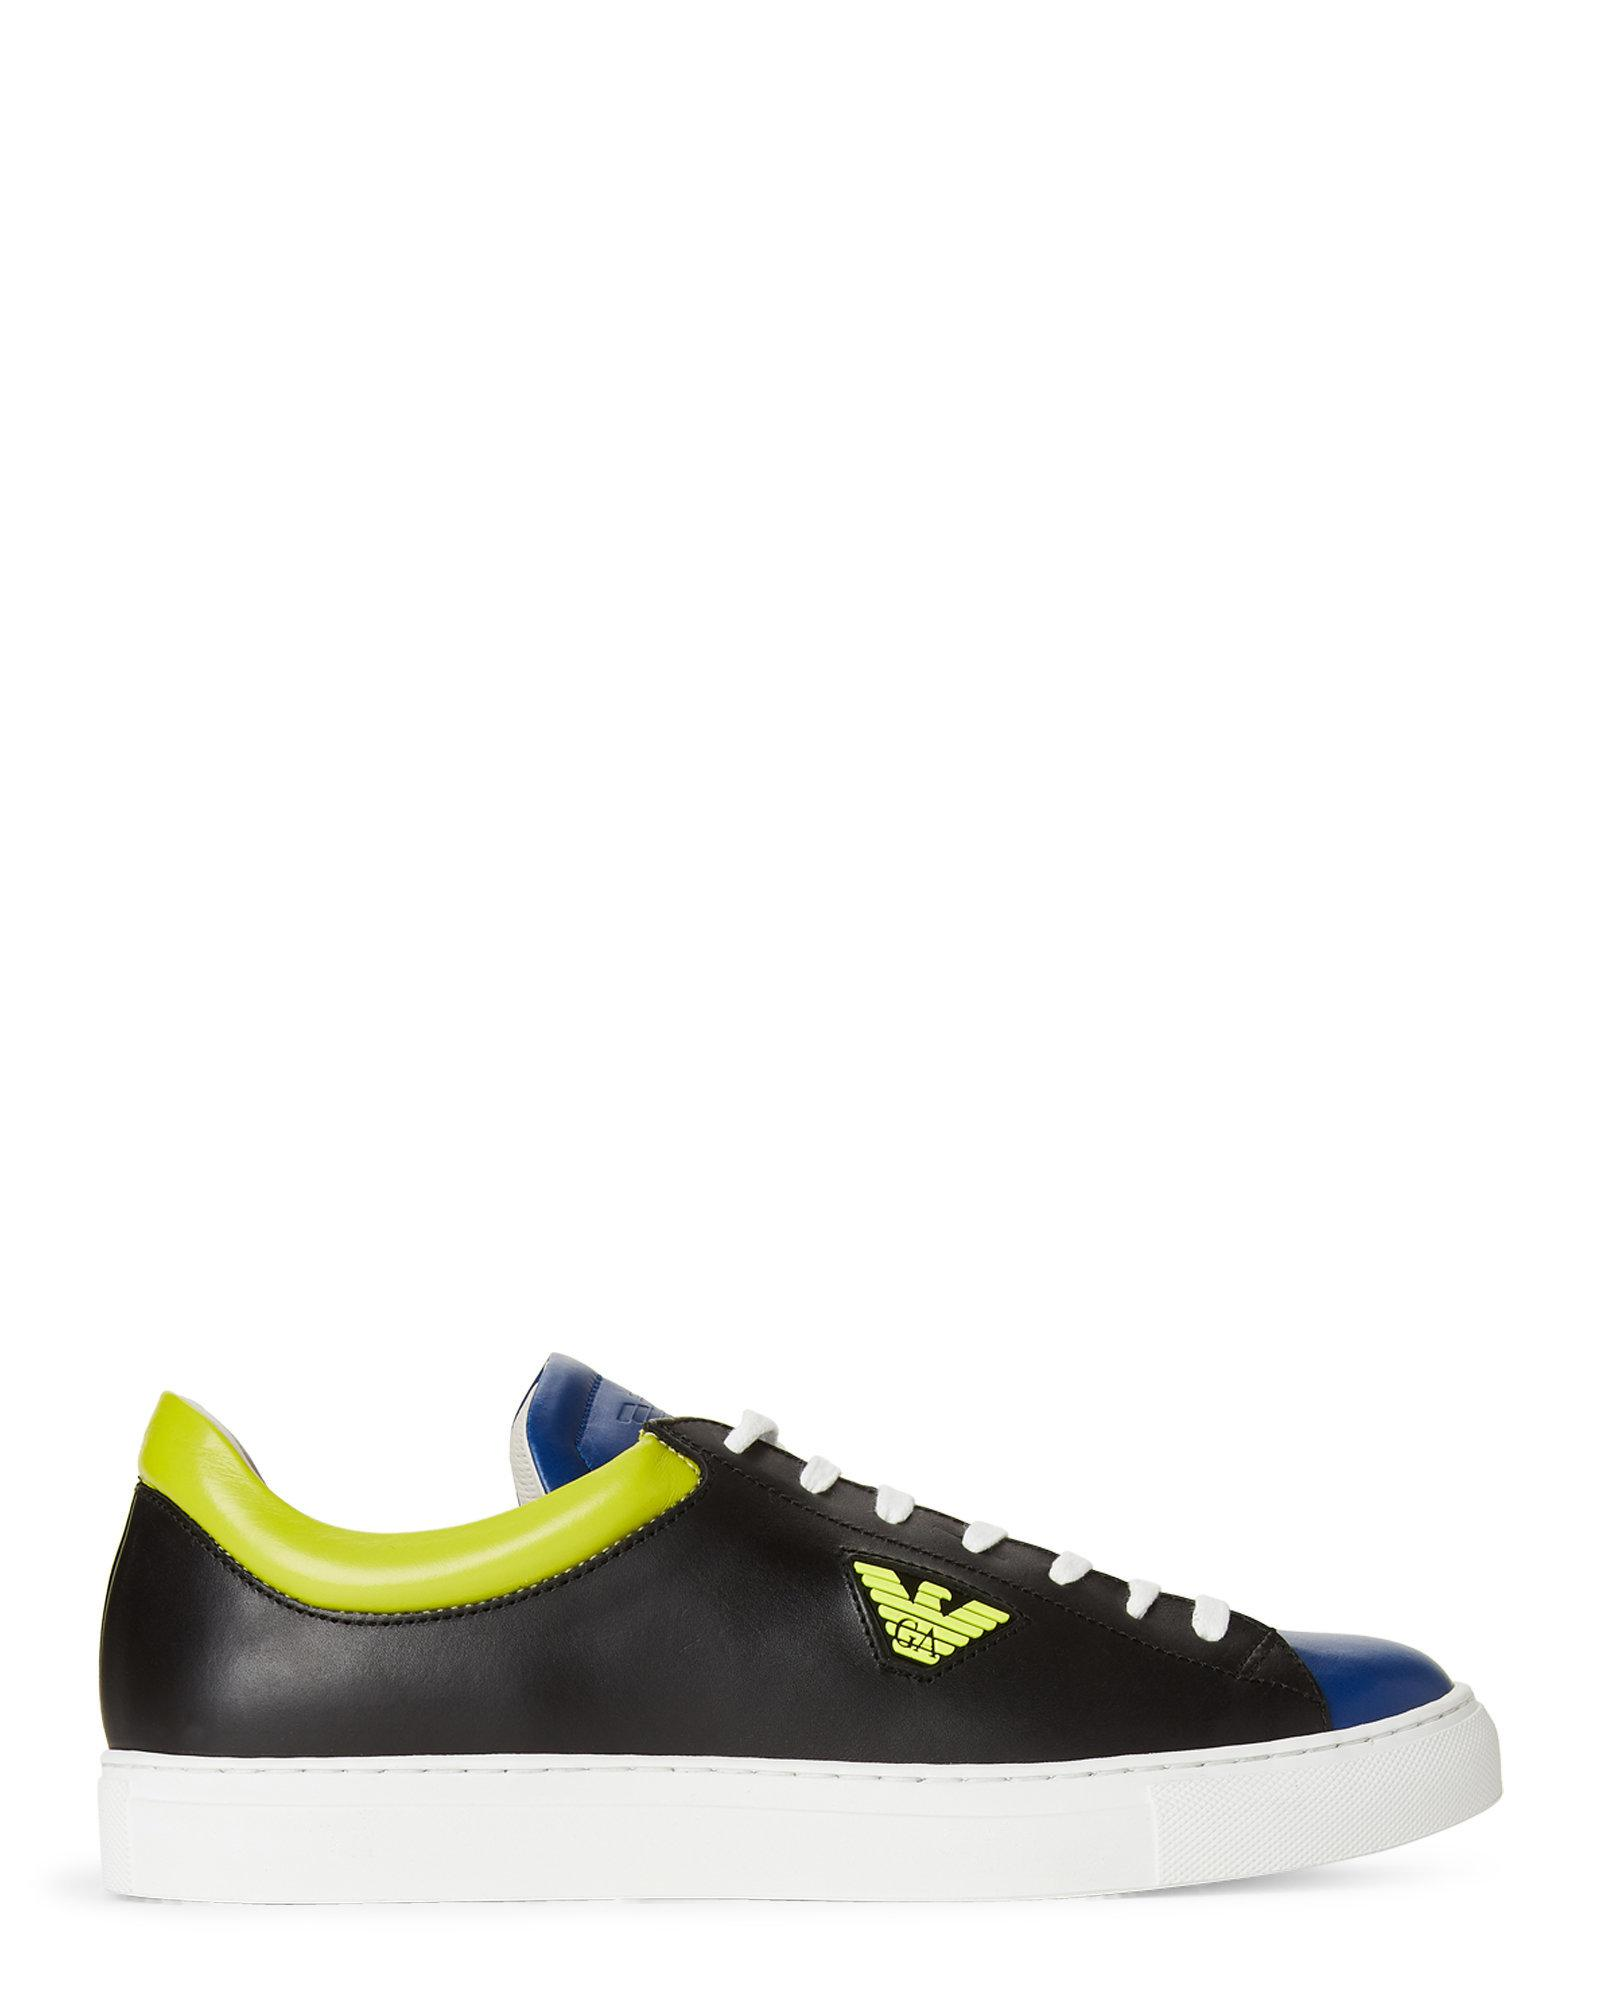 Emporio Armani Trainers - blue/lime/black c17J1kzW